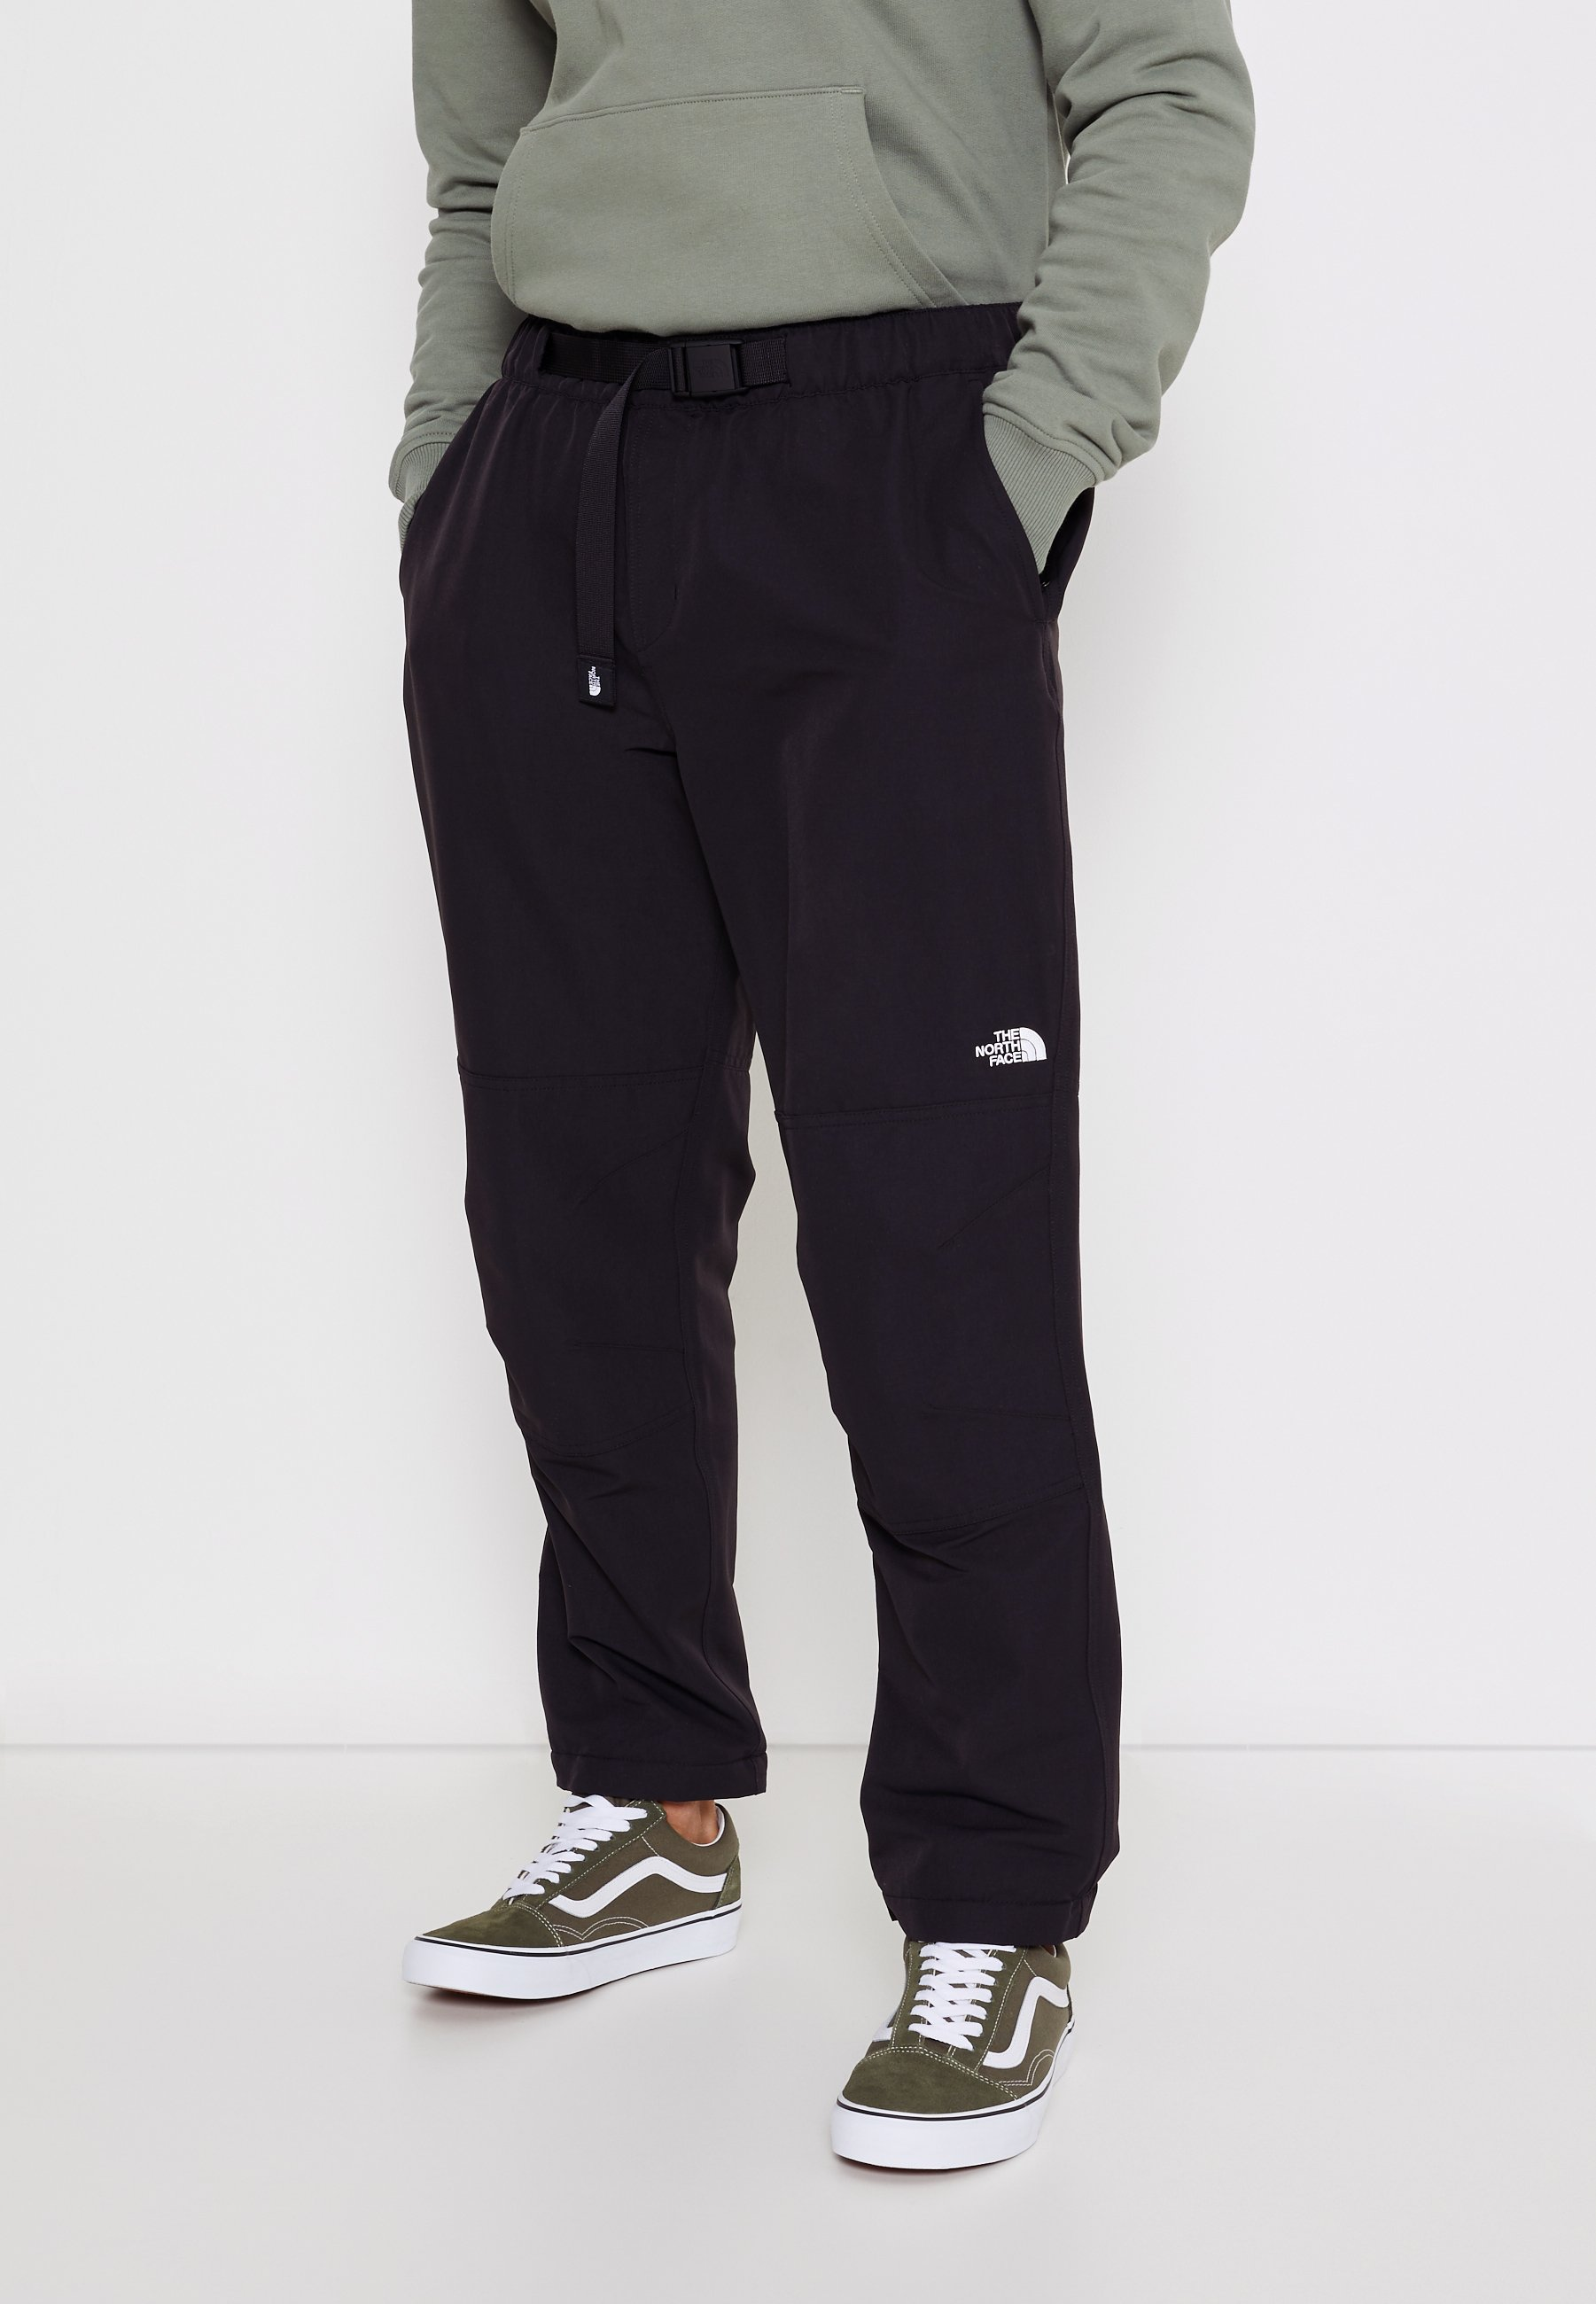 Uomo EXPLORATION CONVERTIBLE PANT - Pantaloni